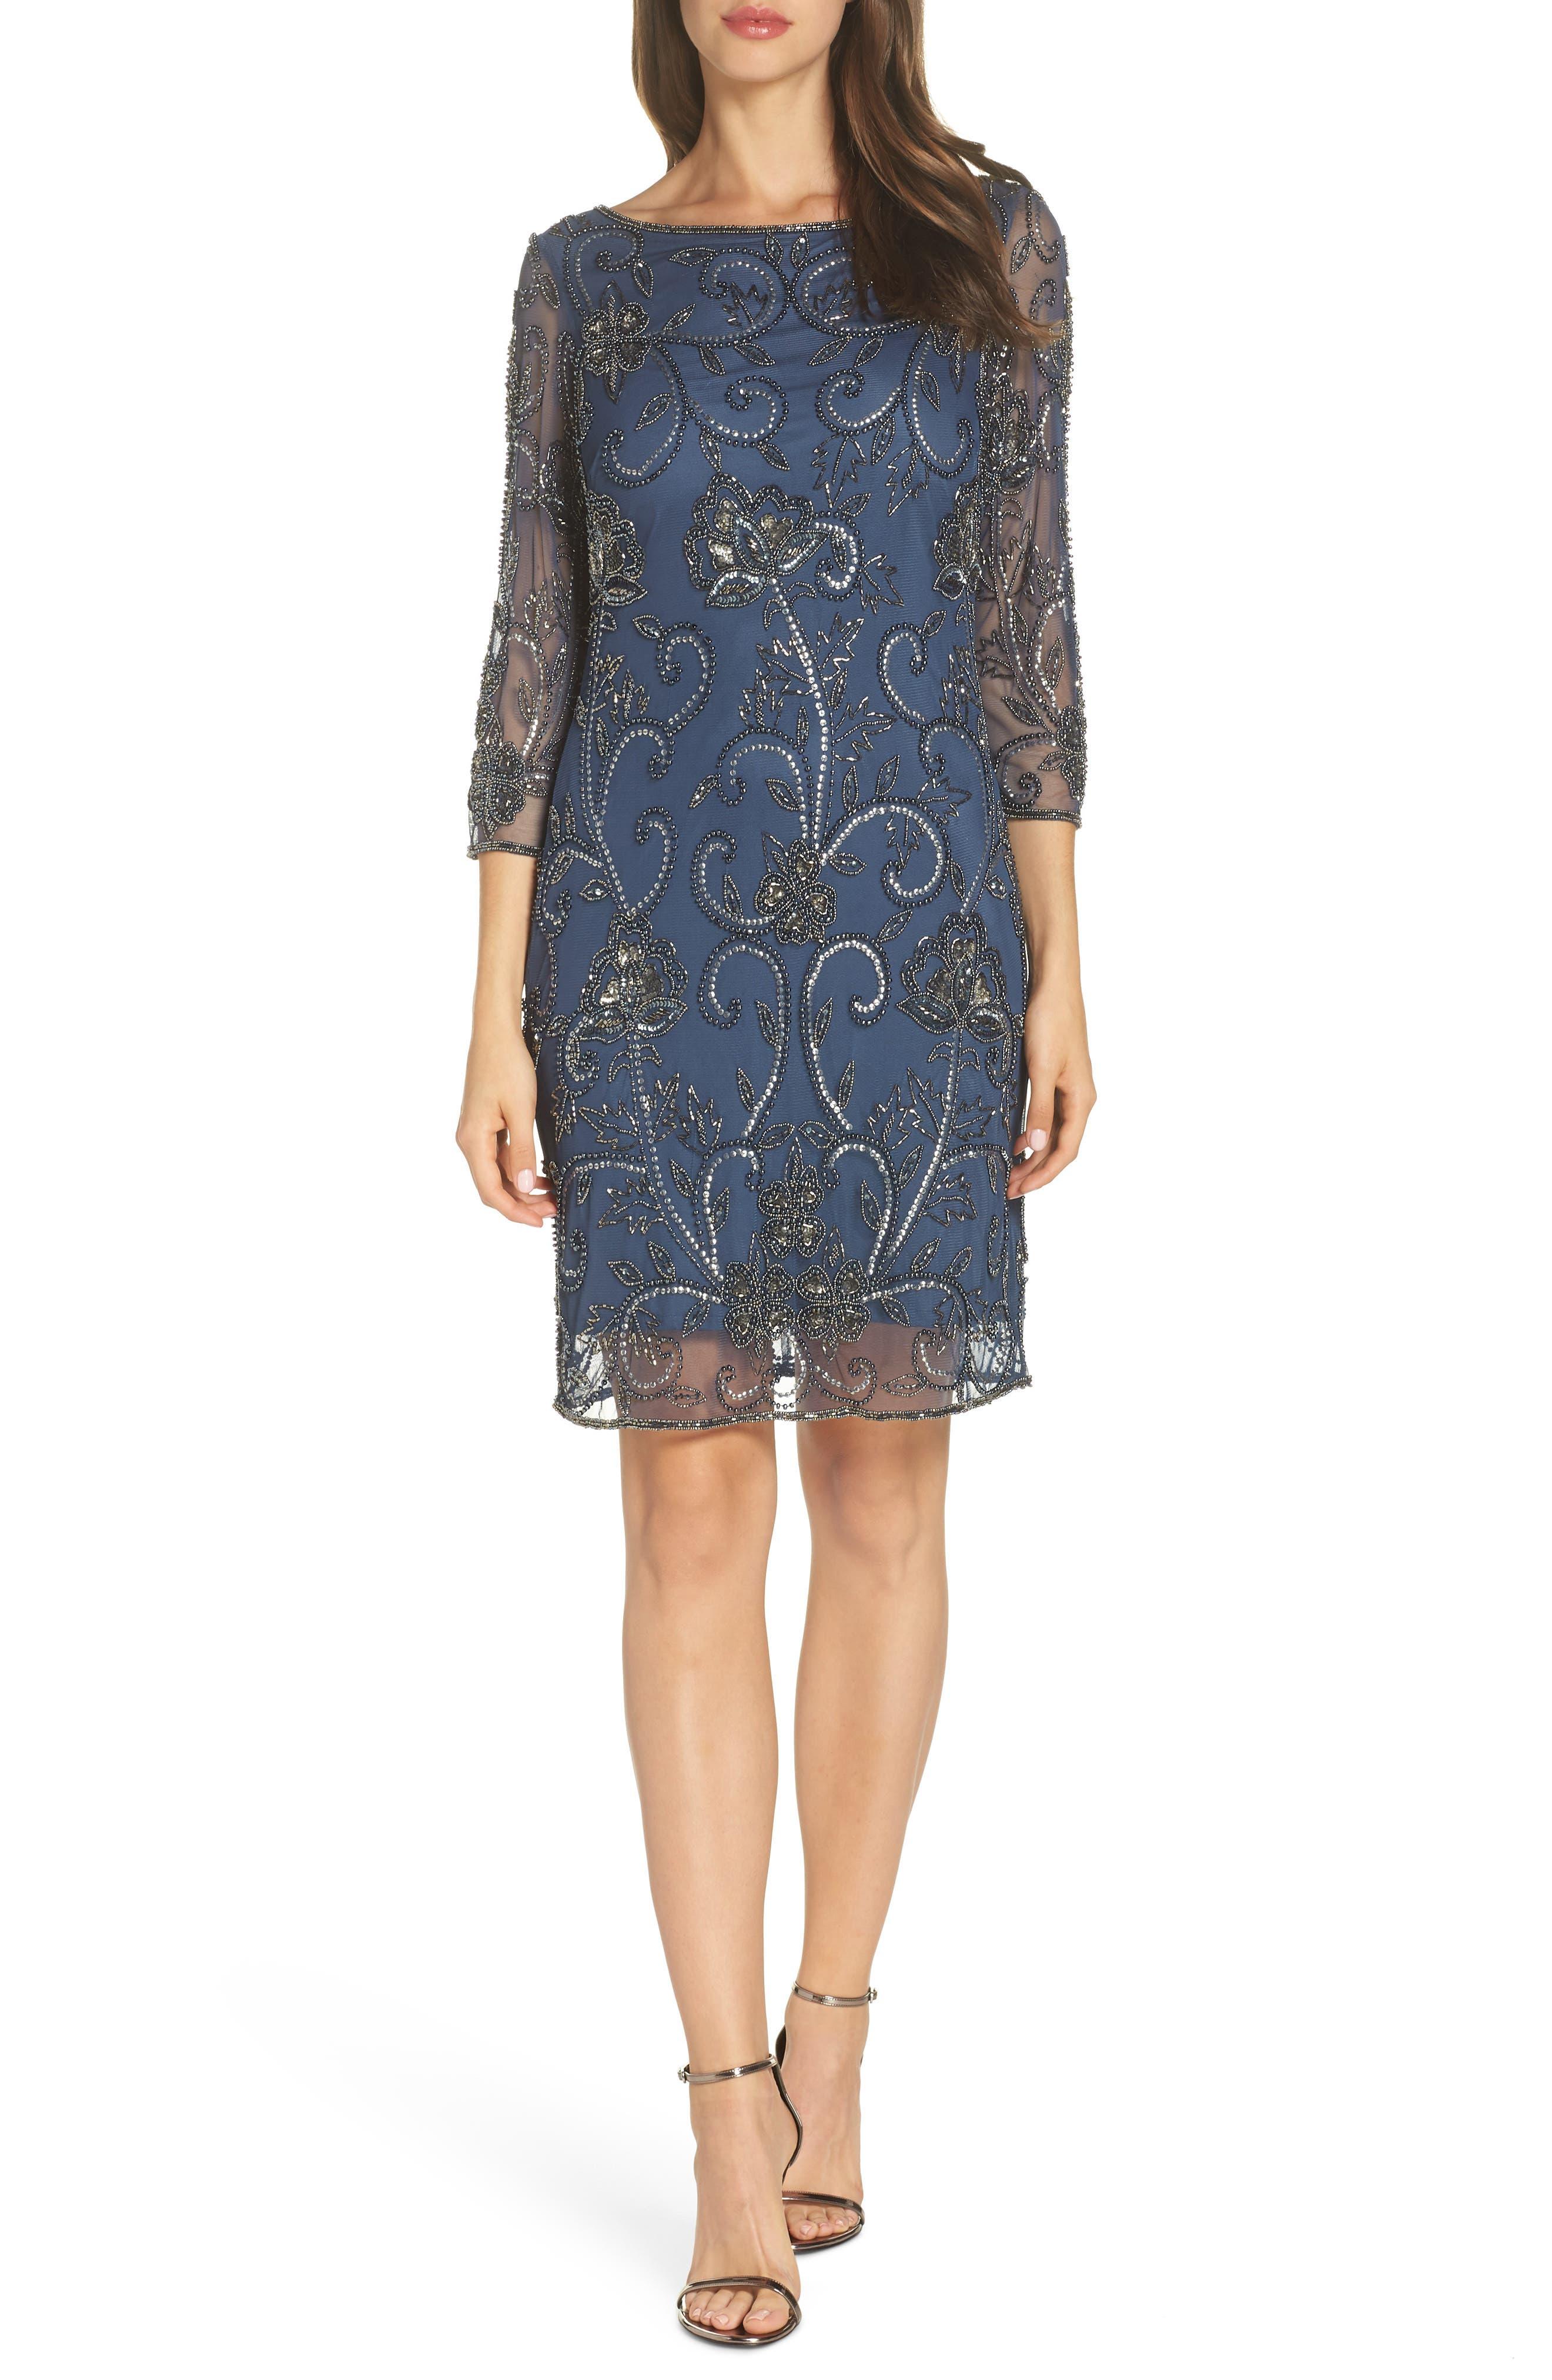 PISARRO NIGHTS, Embellished Mesh Sheath Dress, Main thumbnail 1, color, BLUE